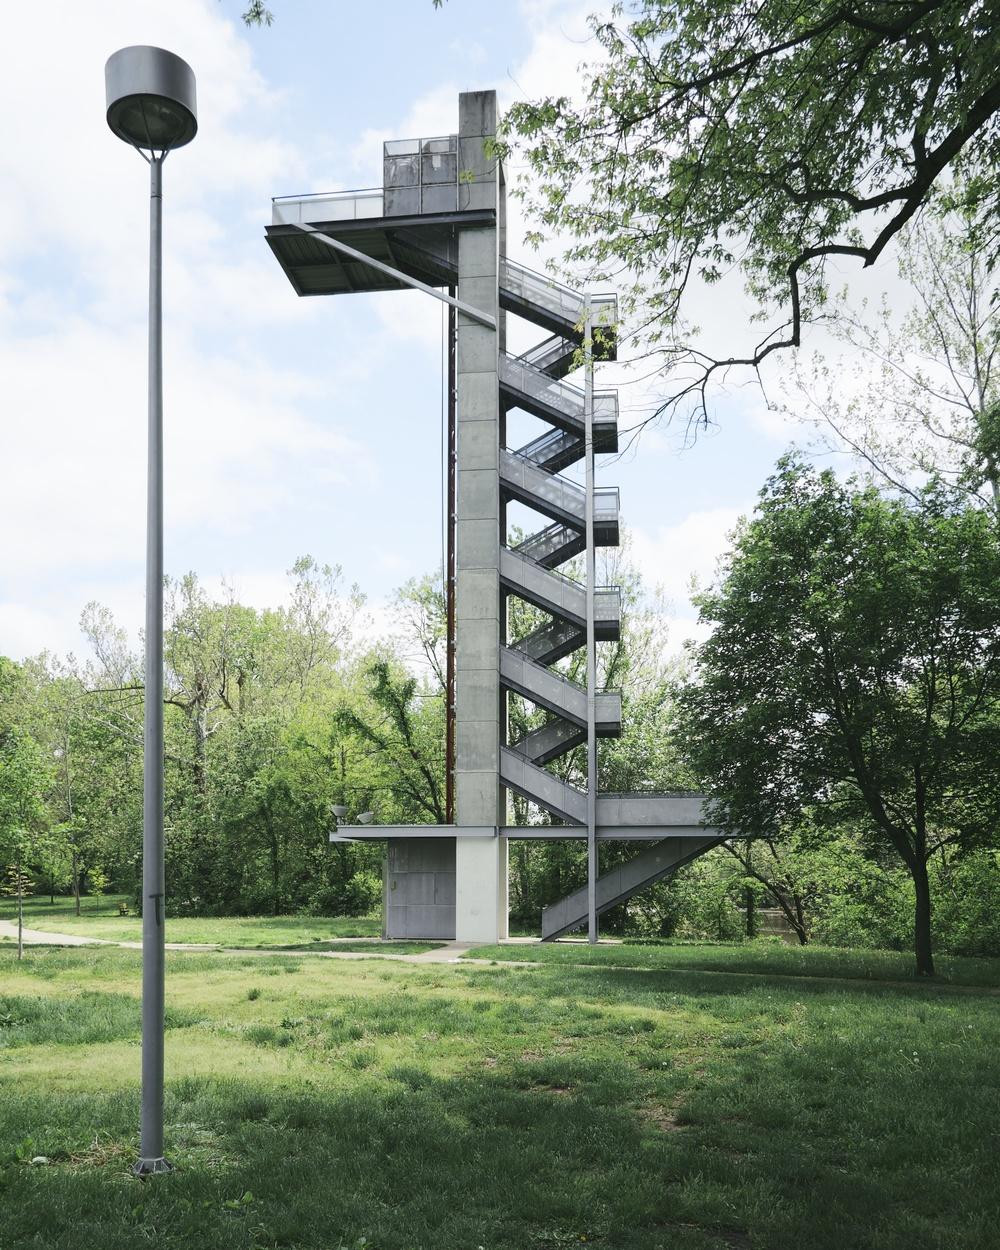 Mill Race Park is an 86-acre downtown riverfront park. Landscape design by Michael Van Valkenburgh and structures designed by Stanley Saitowitz.